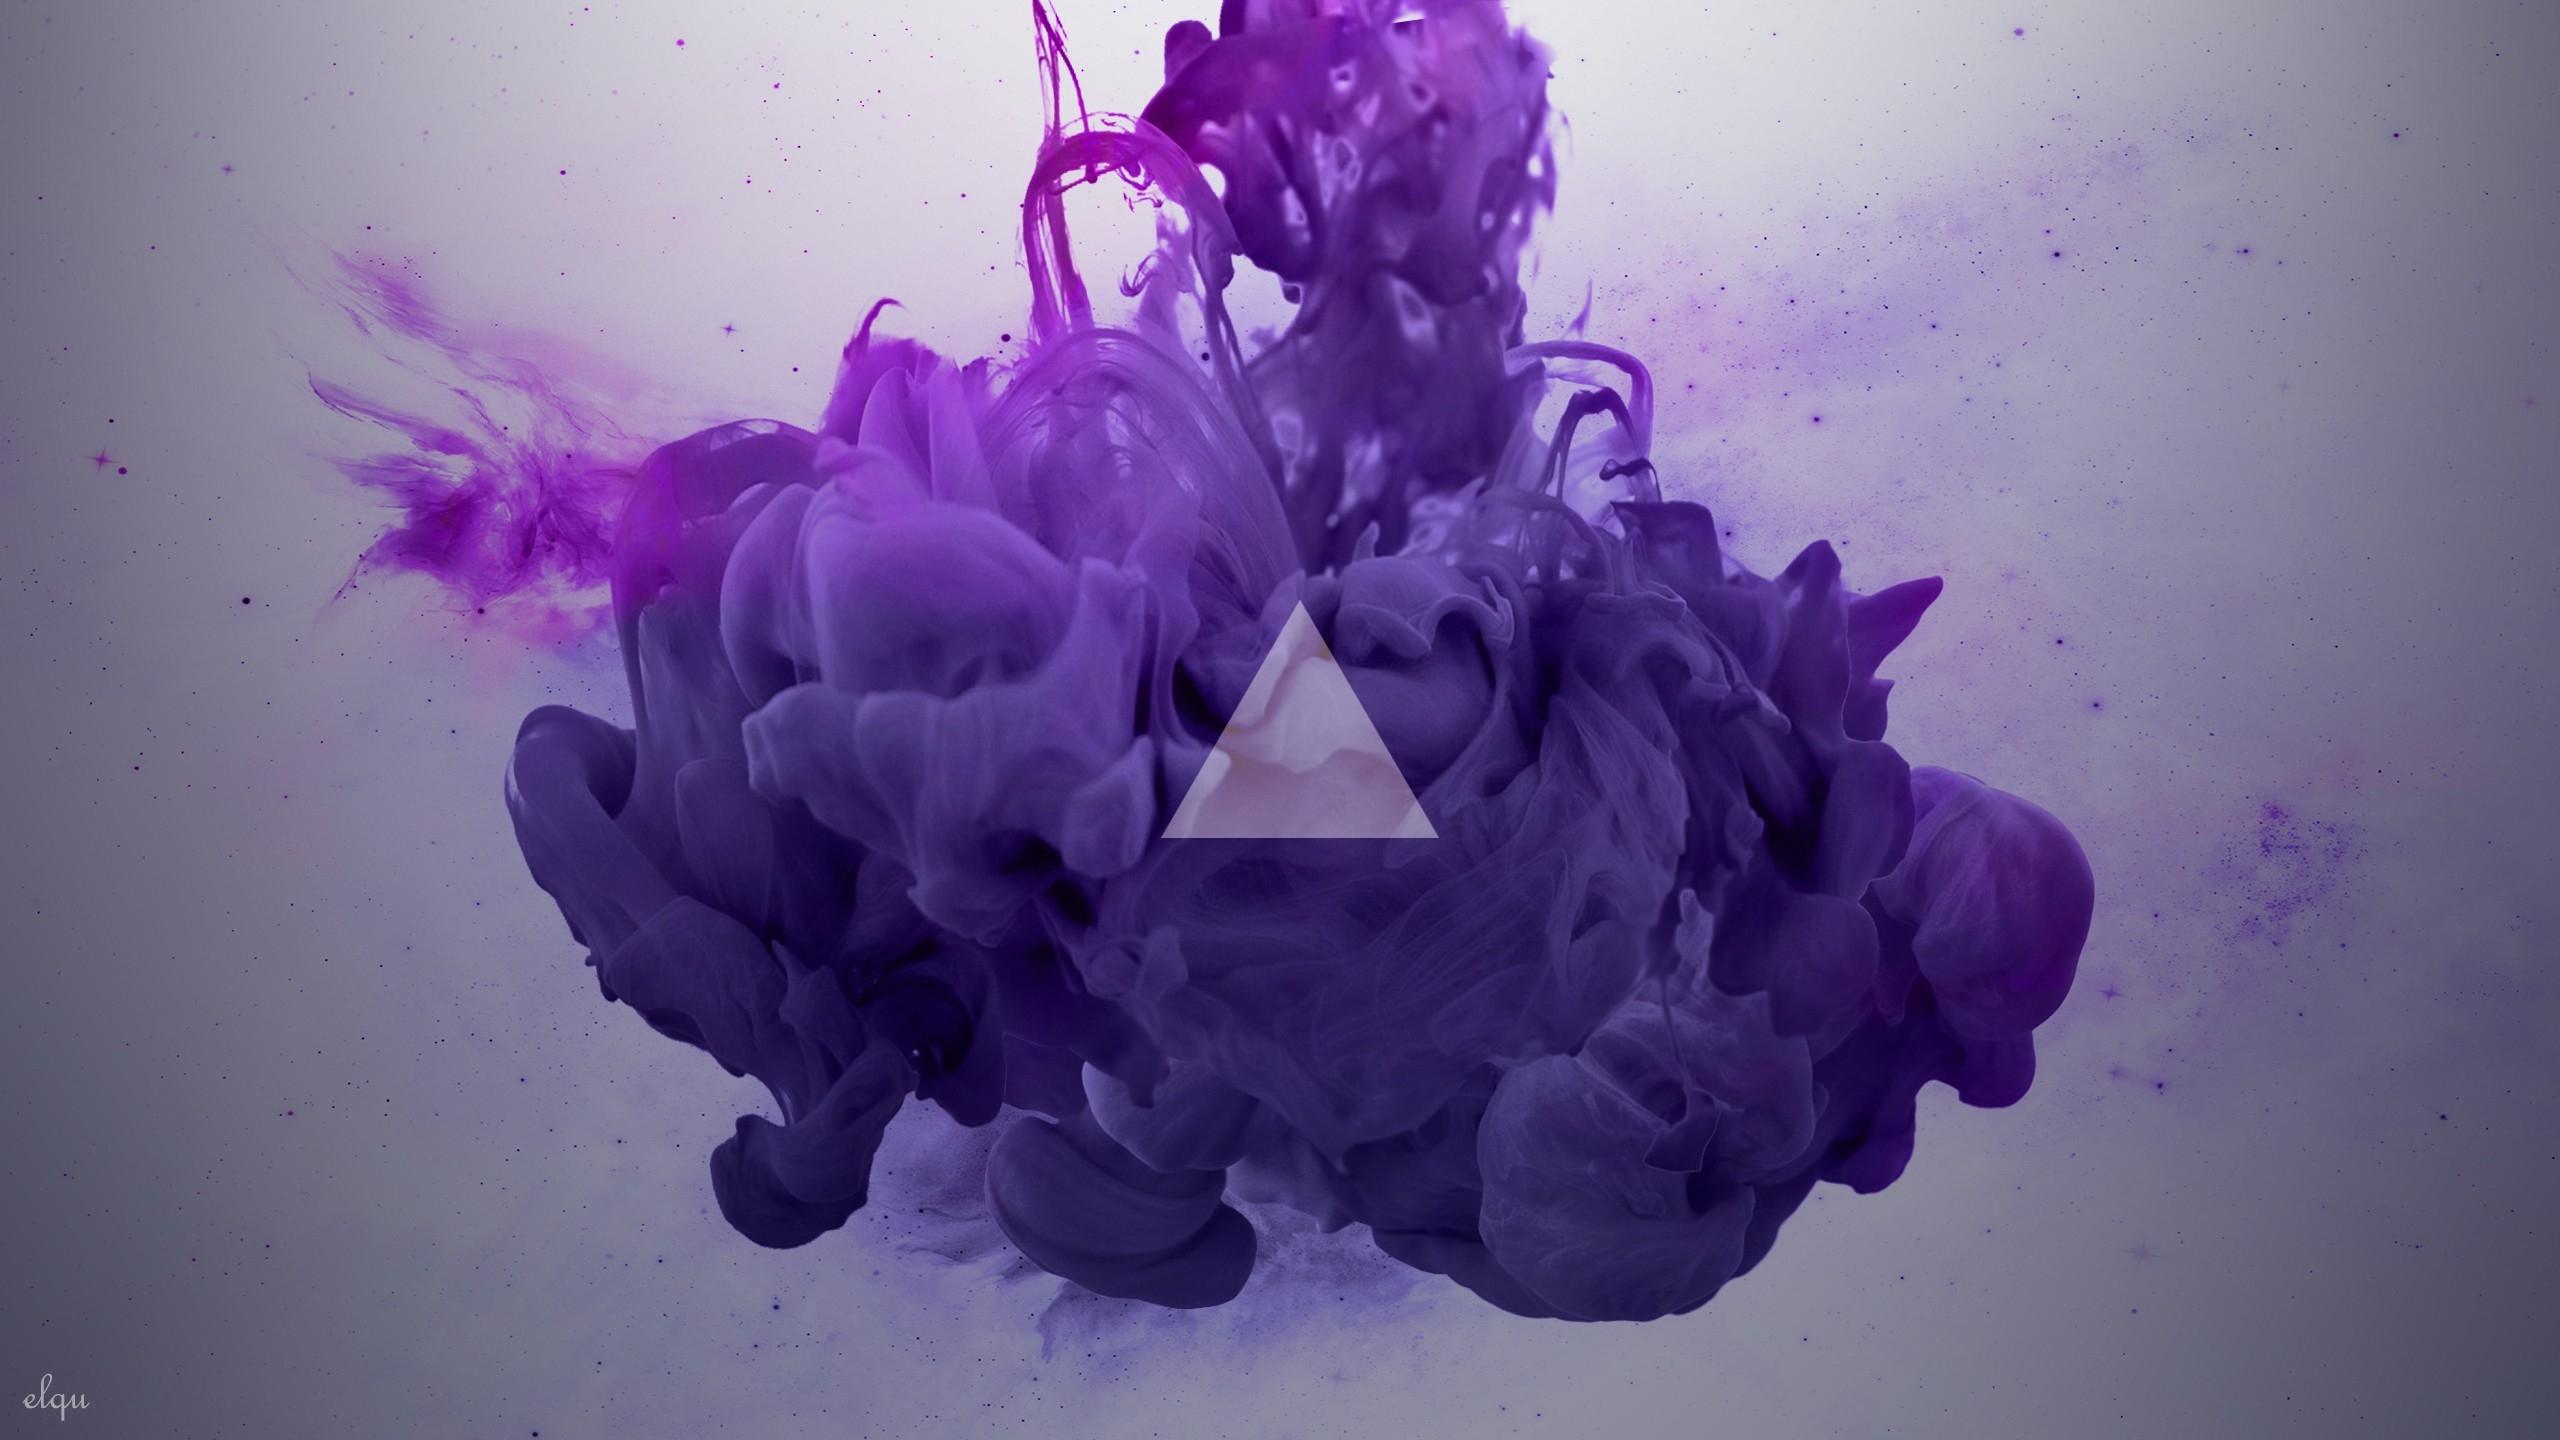 Fond D Ecran Illustration Violet Fumee Bleu Triangle Rose